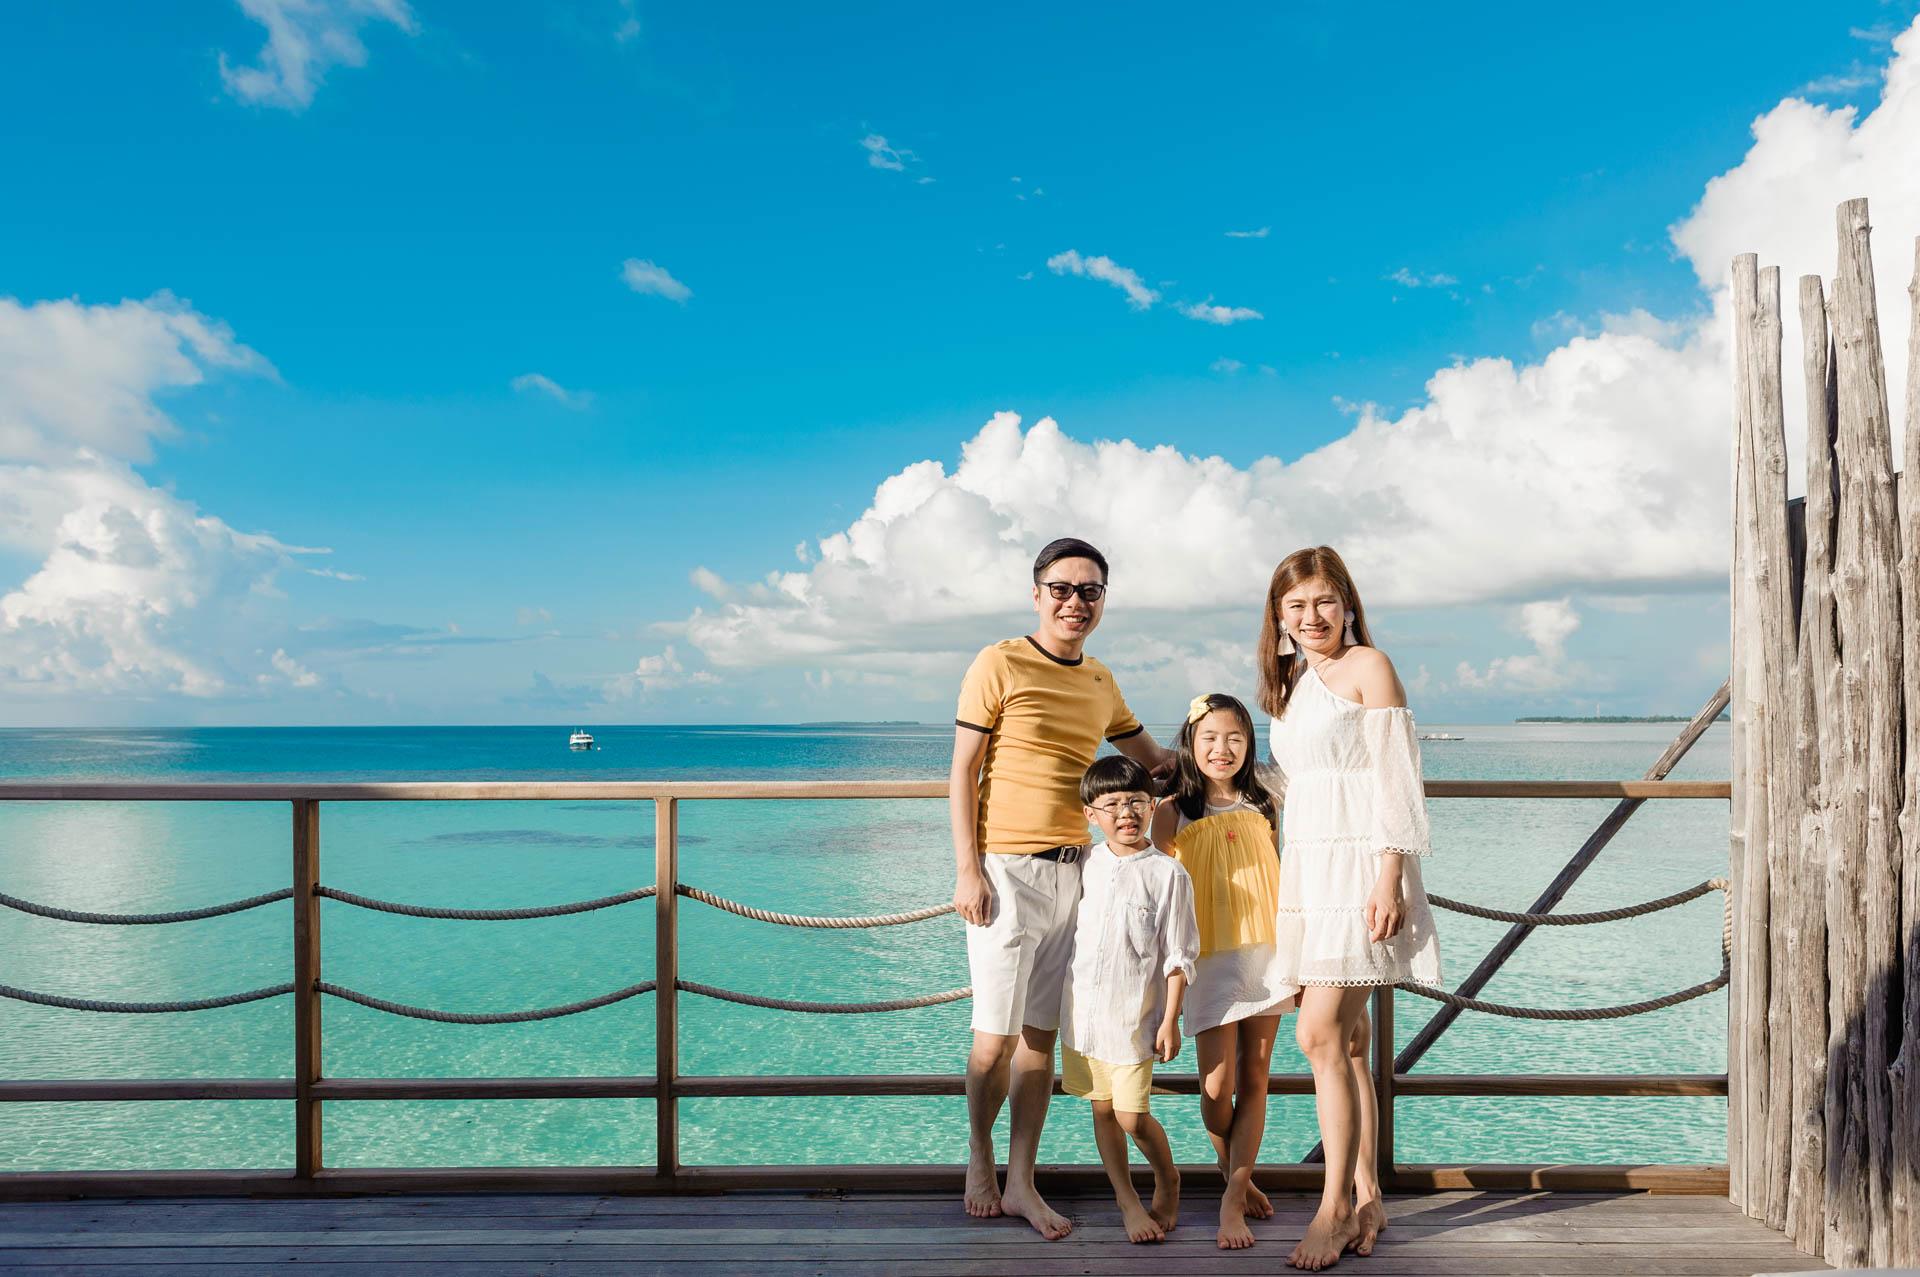 Jos Extended Family at Constance Moofushi Maldives 51